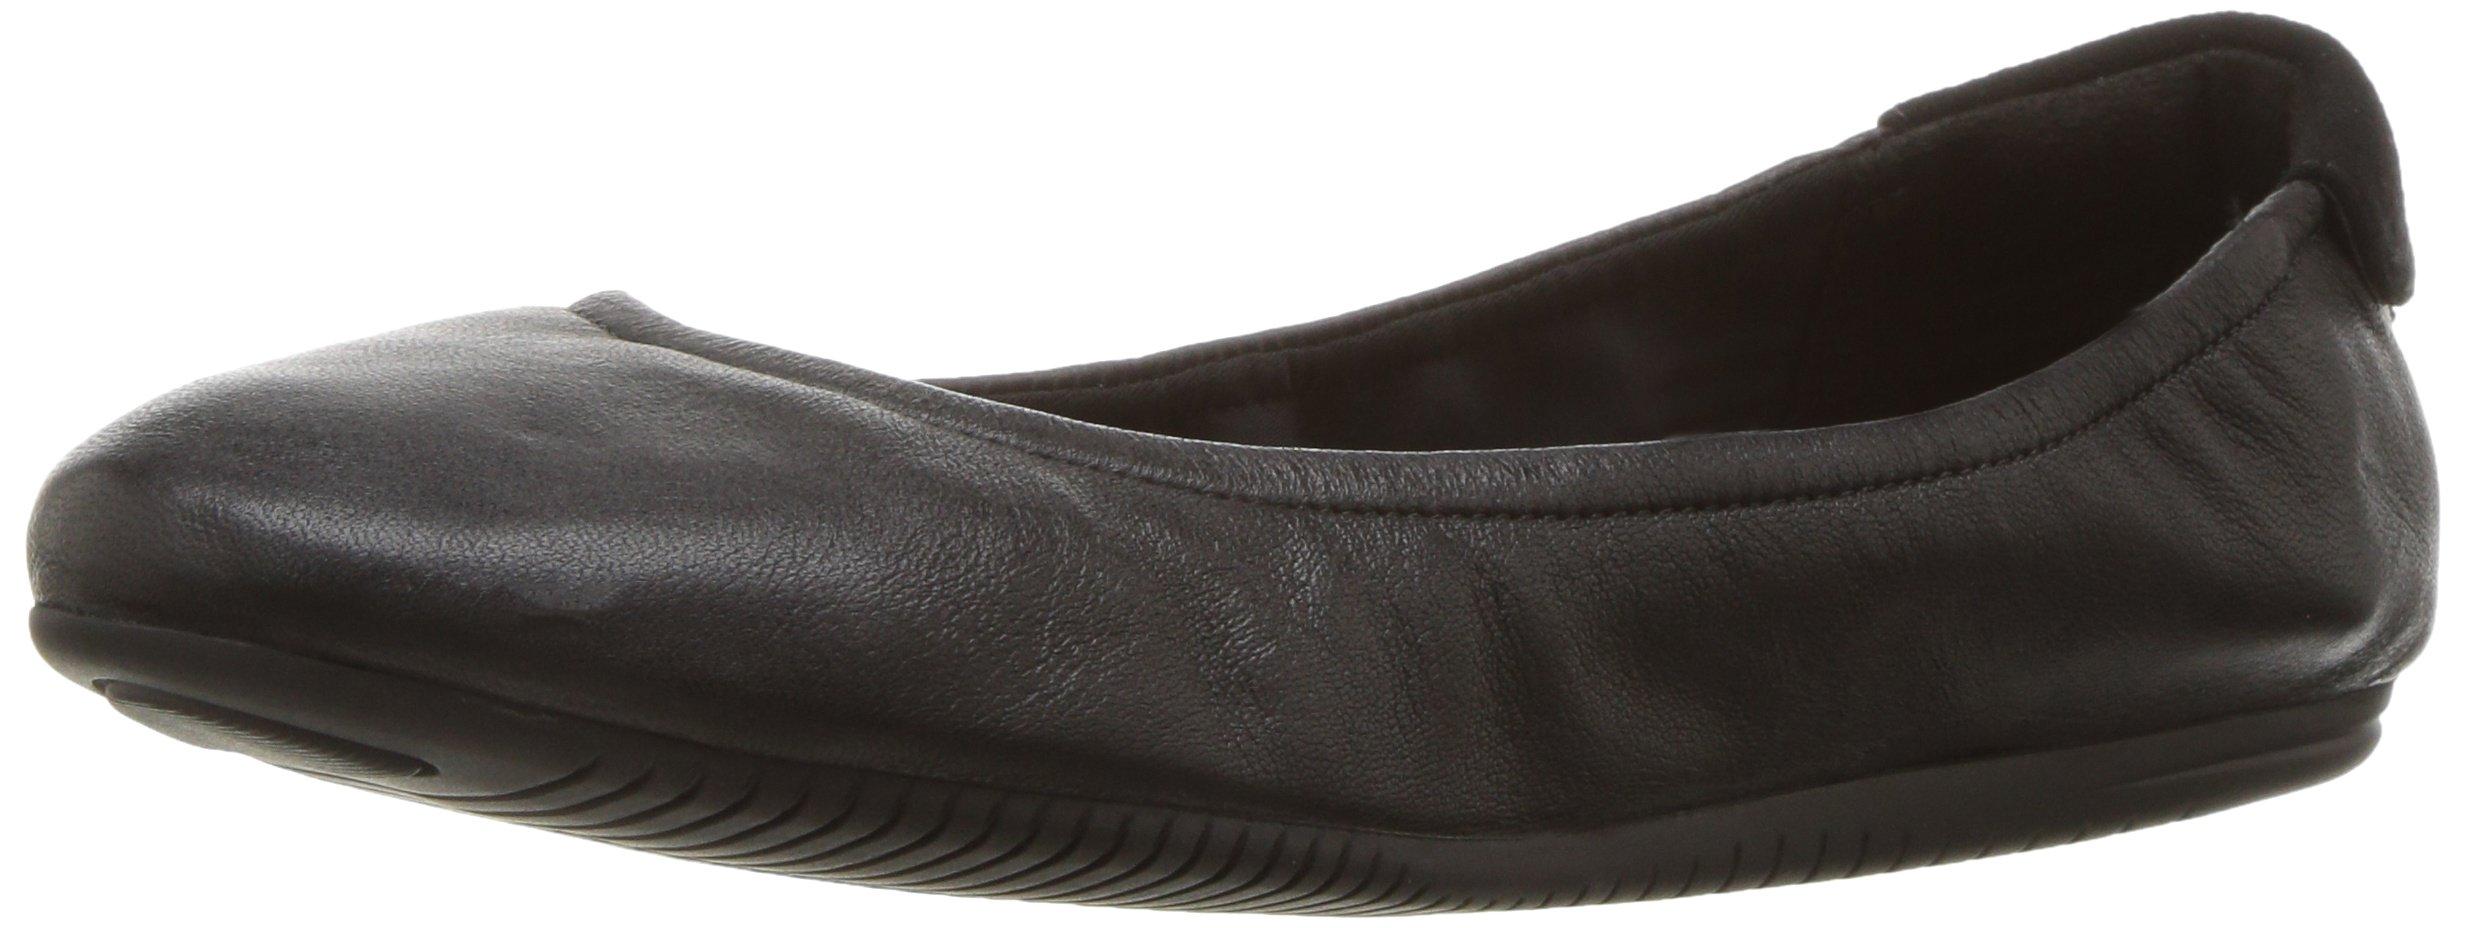 Cole Haan Studiogrand Convertible Ballet Flat,Black Leather,8.5 B US